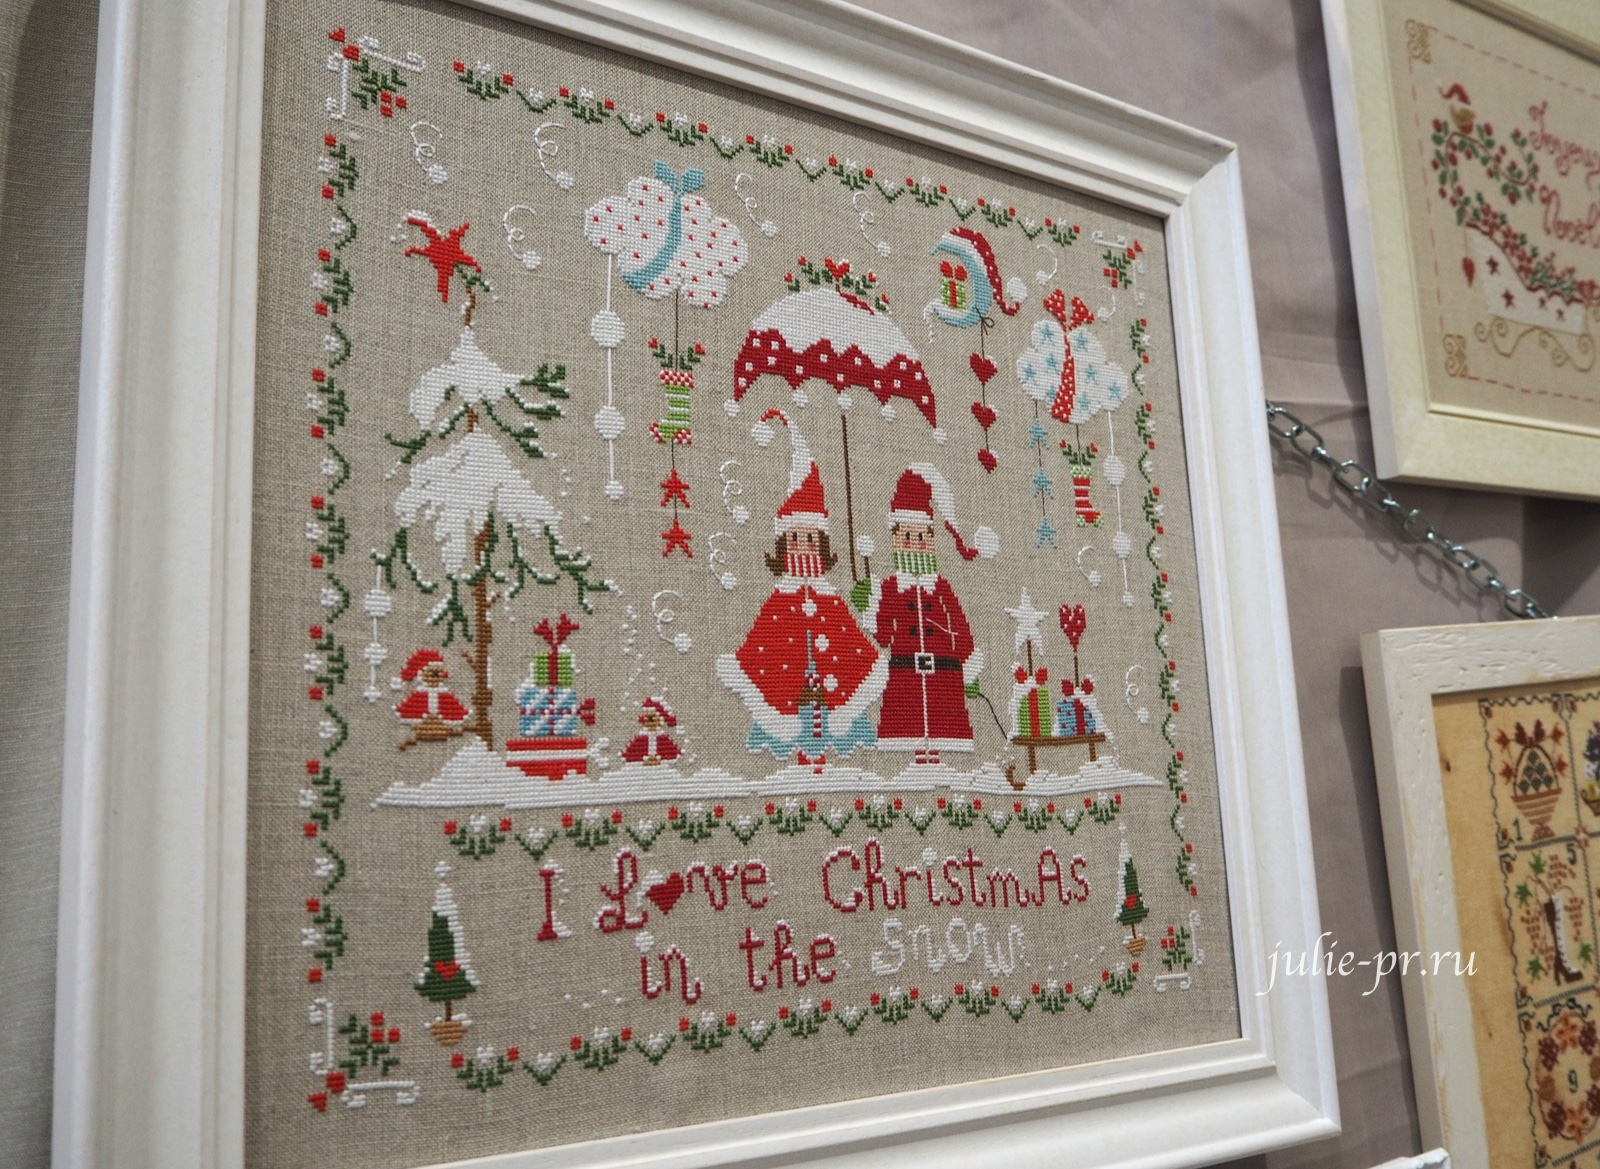 Cuore e batticuore, Christmas in the Snow, Снежное Рождество, вышивка крестом